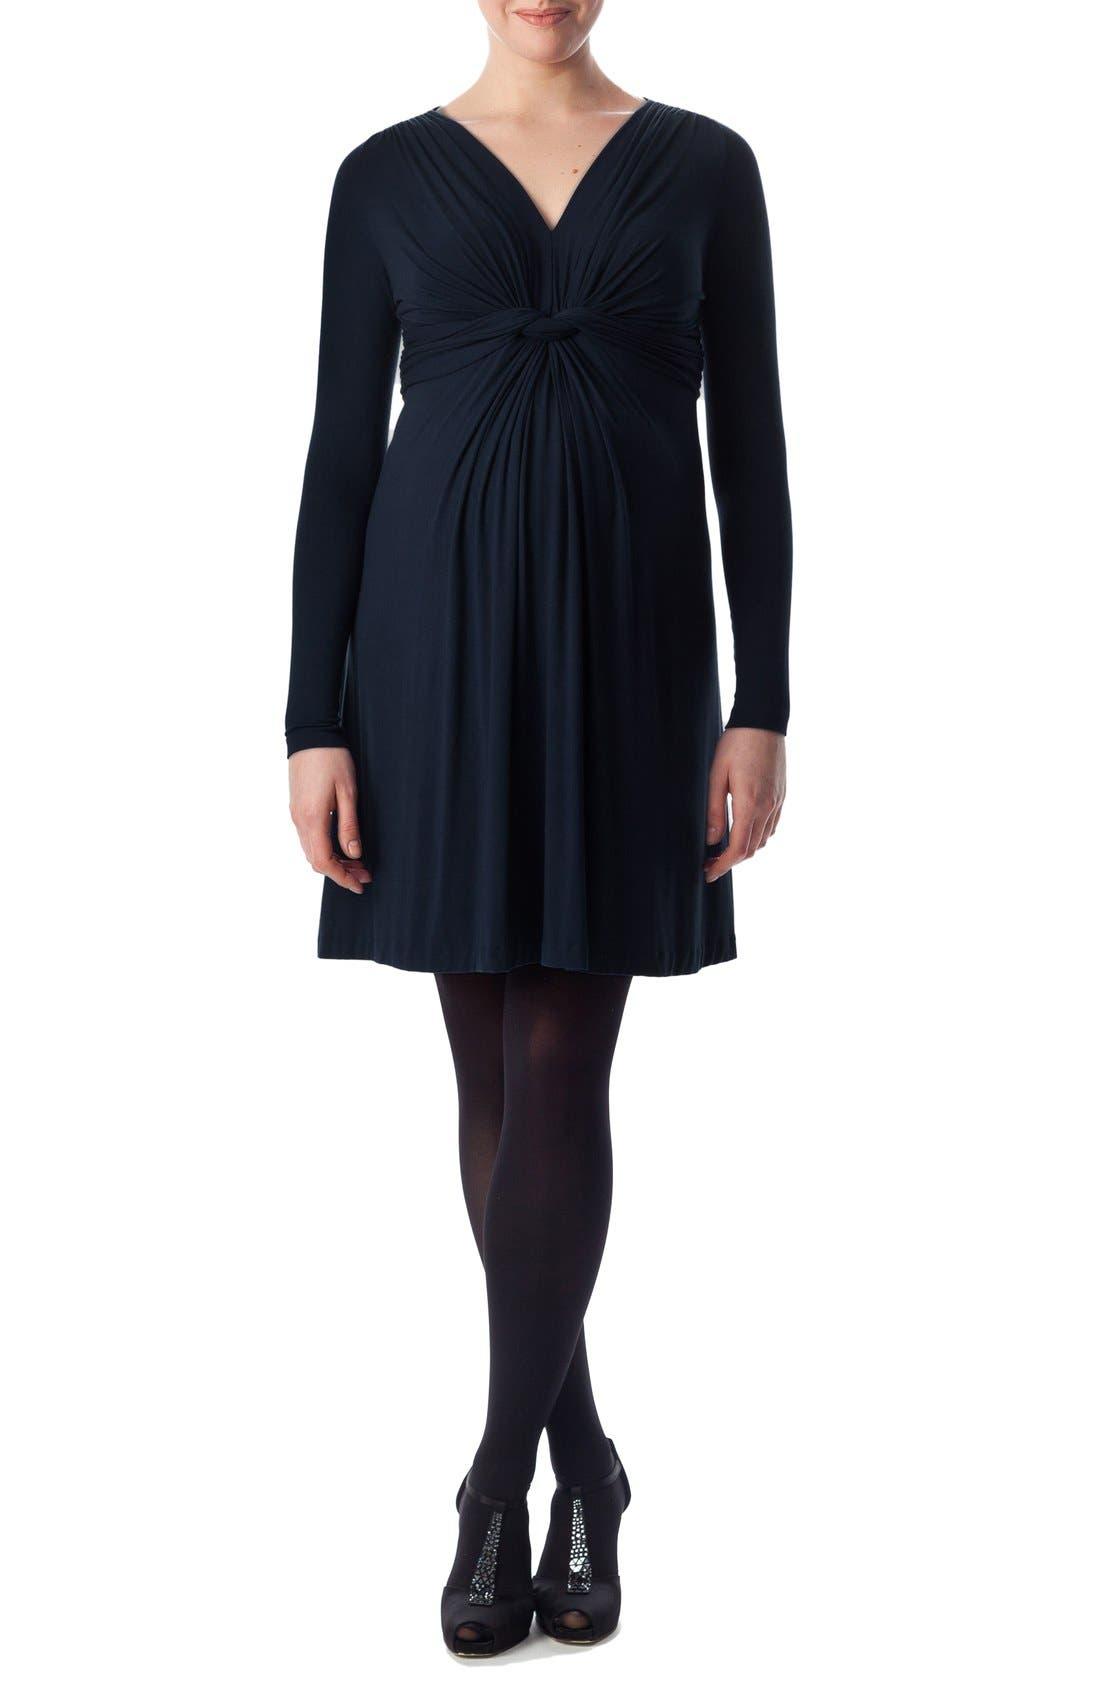 Alternate Image 1 Selected - PIETRO BRUNELLI 'Madonna' Twist Detail Jersey Maternity Dress